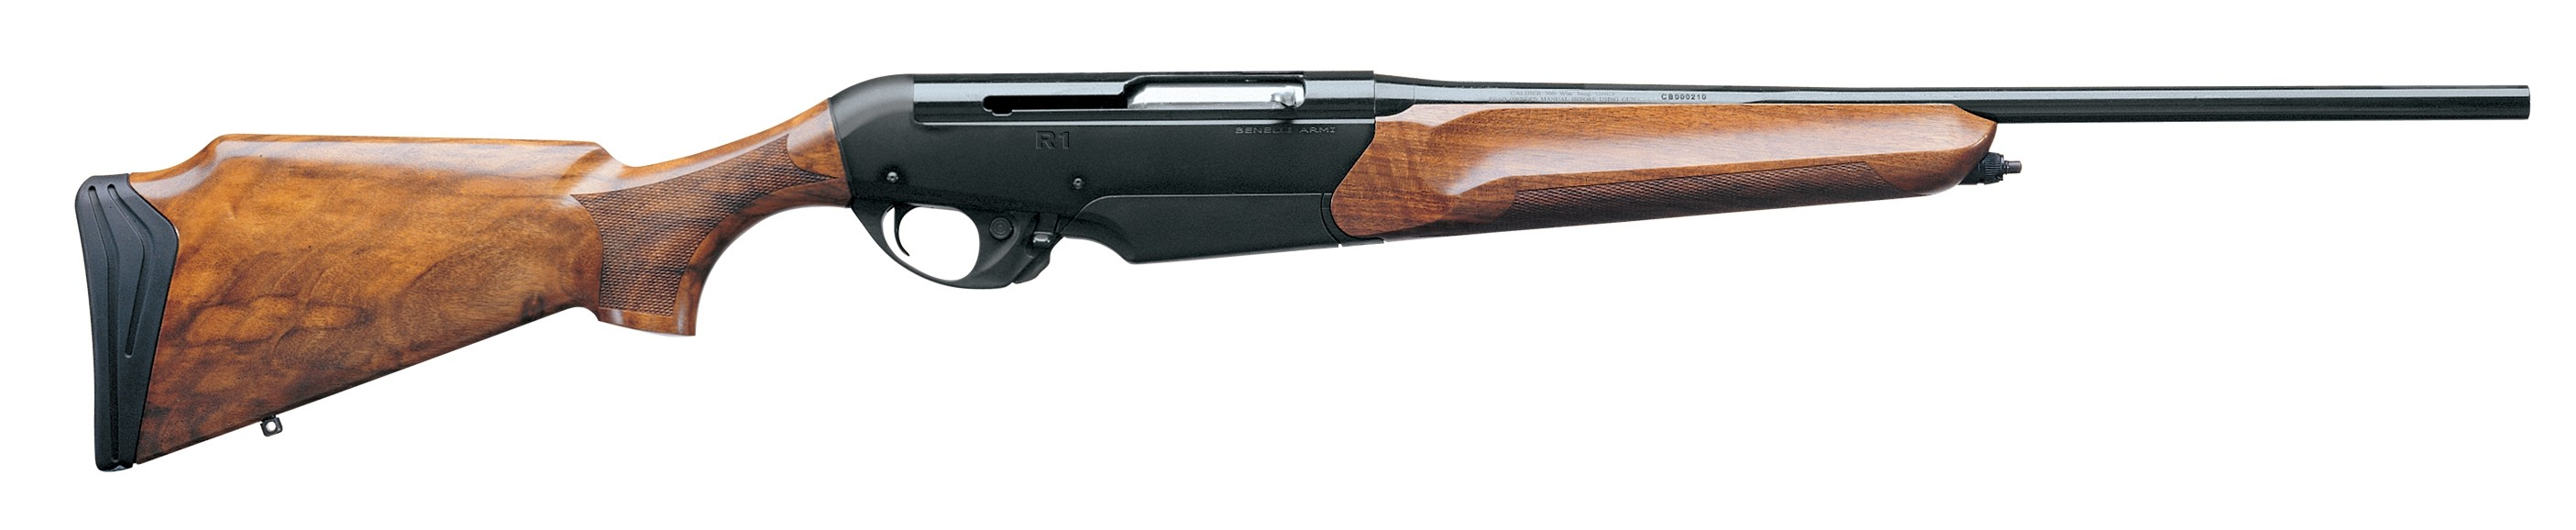 Benelli R1 Standard Wood Stock